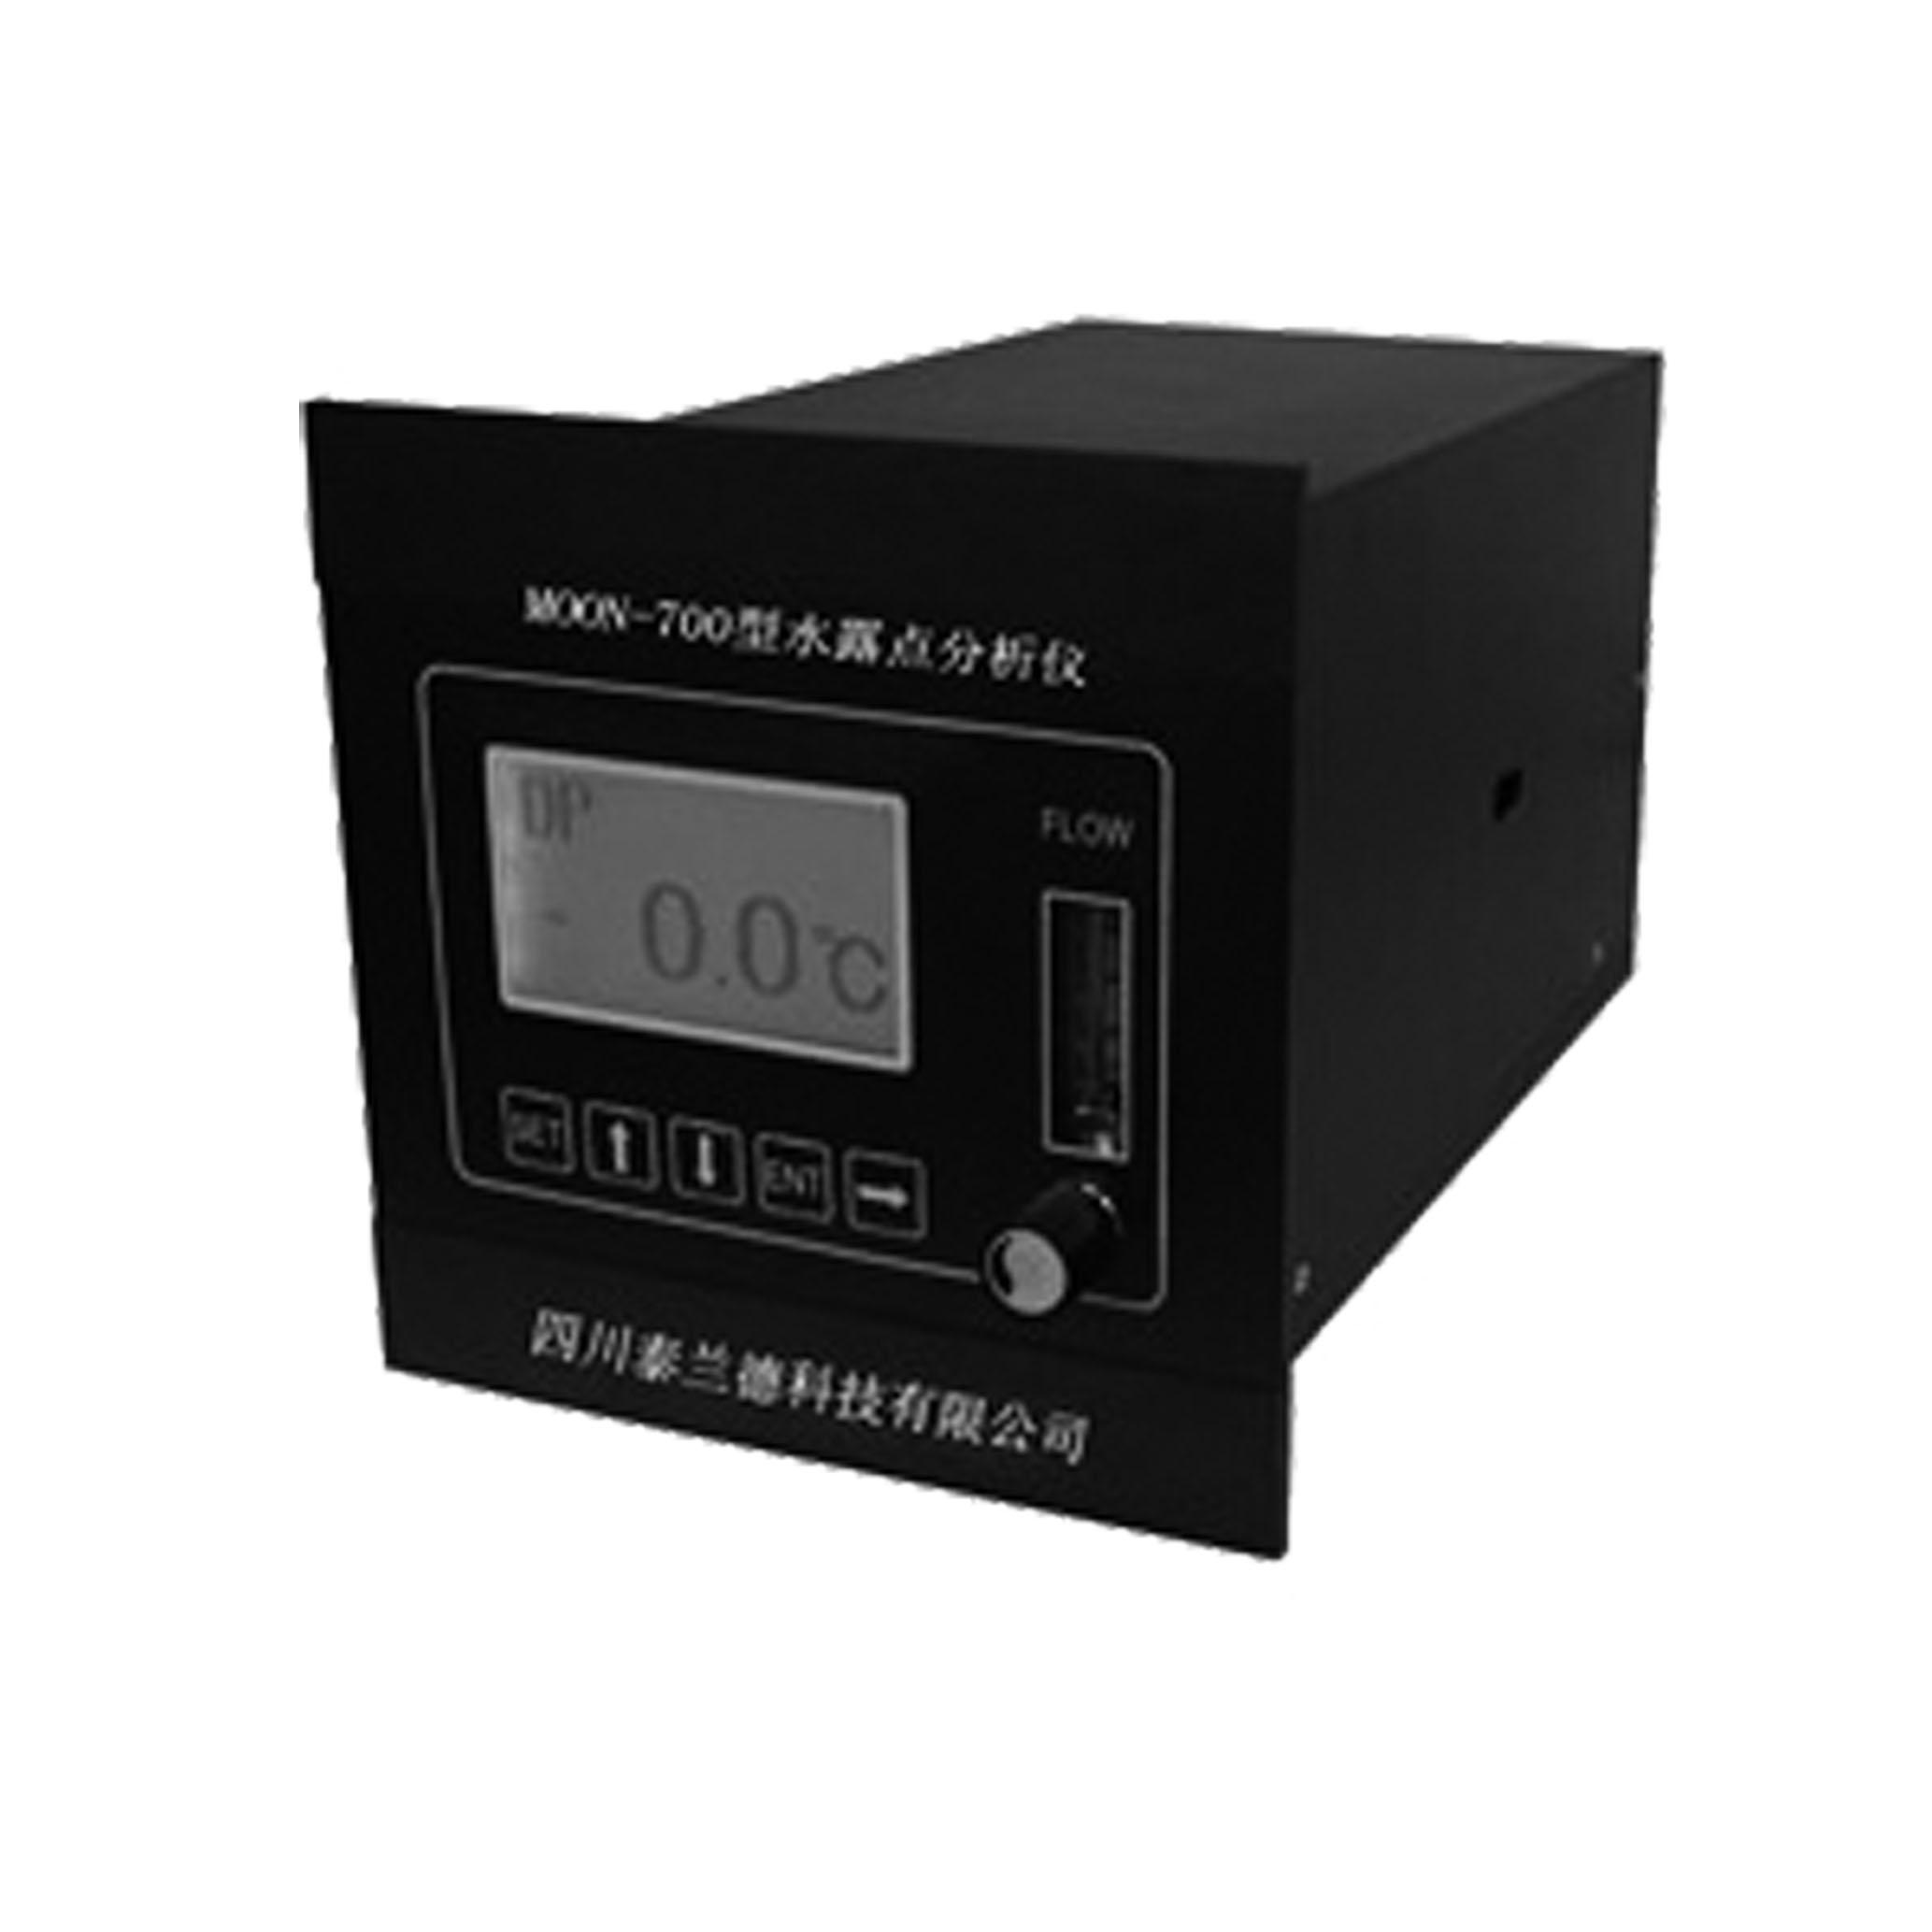 MOON-700水亚博电竞登录仪